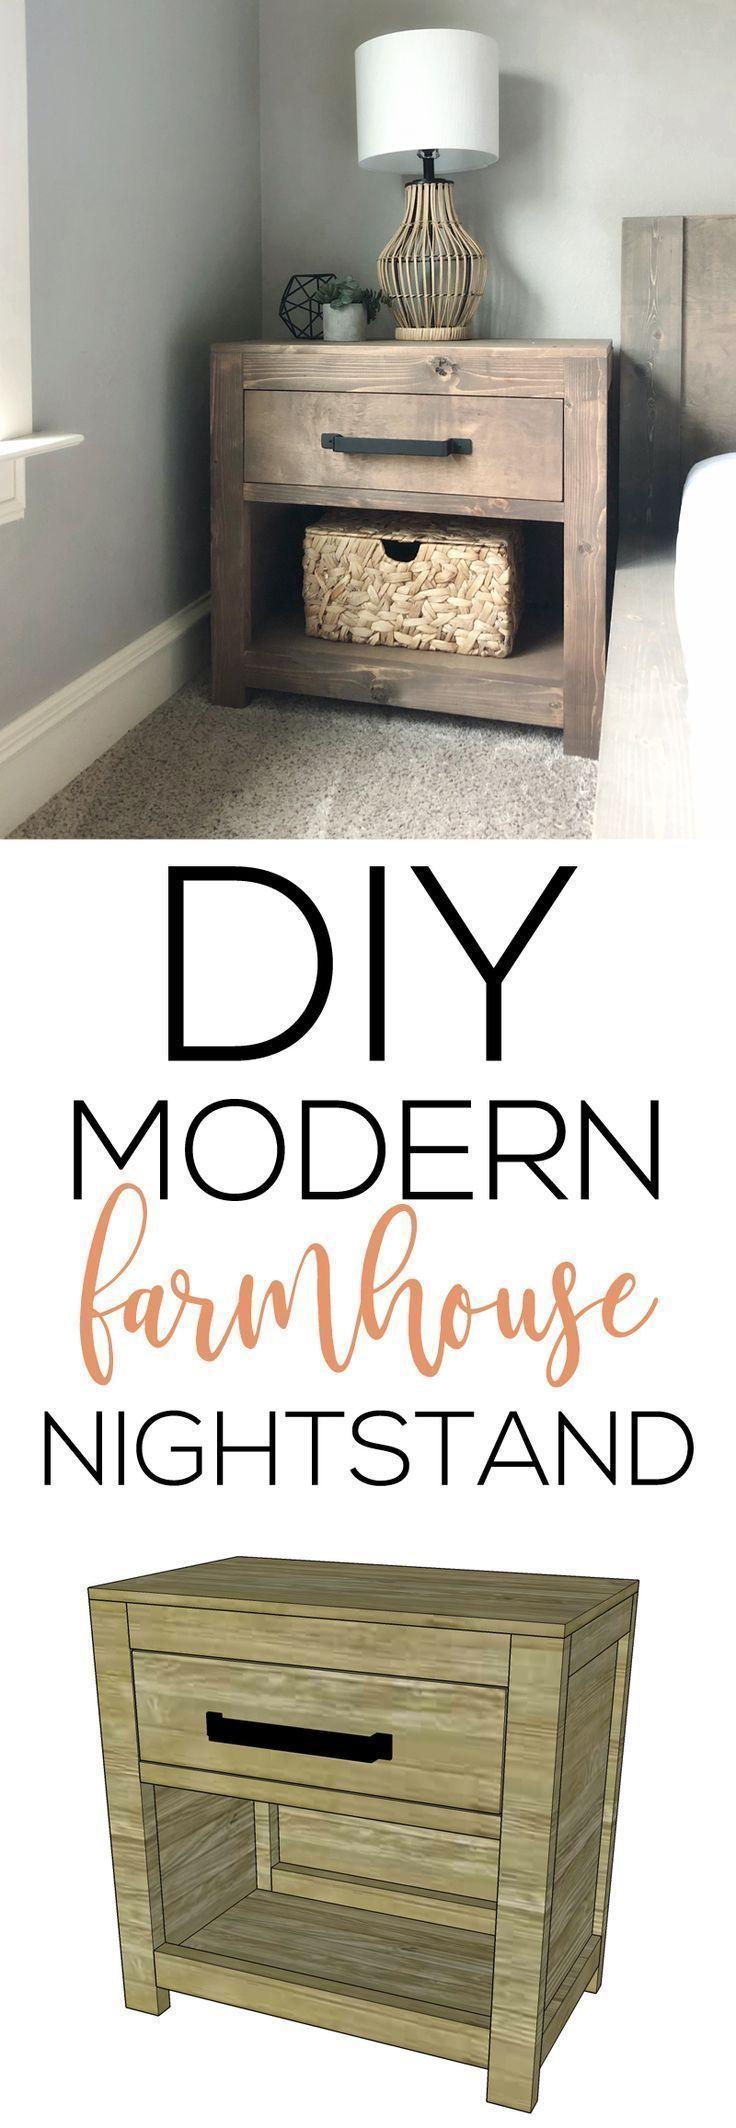 Diy modern farmhouse nightstand diy nightstand diy